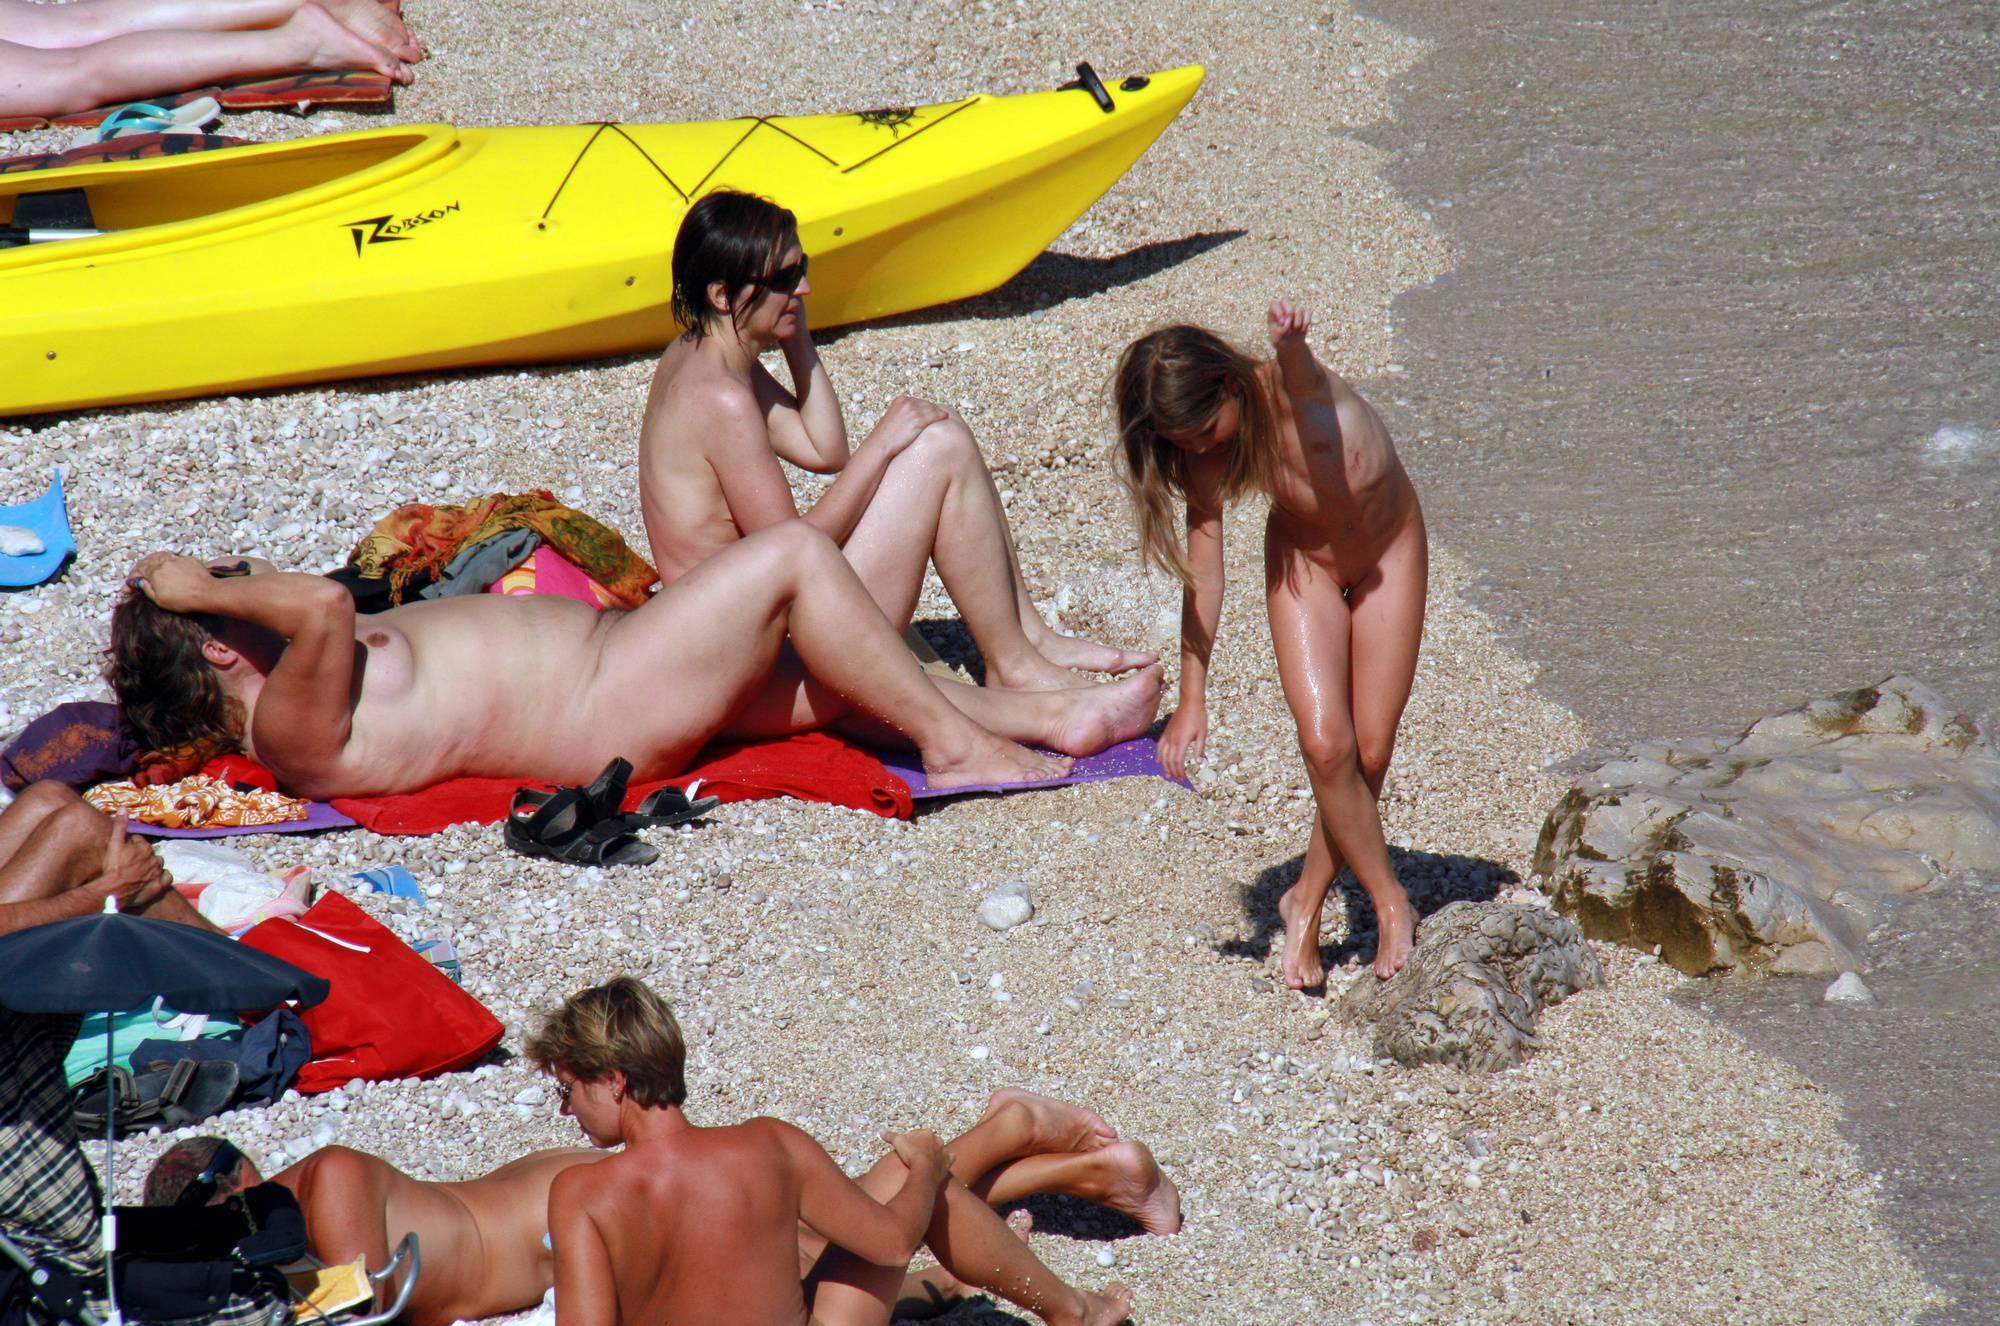 Nudist Photos Naturist Beach Relaxation - 1